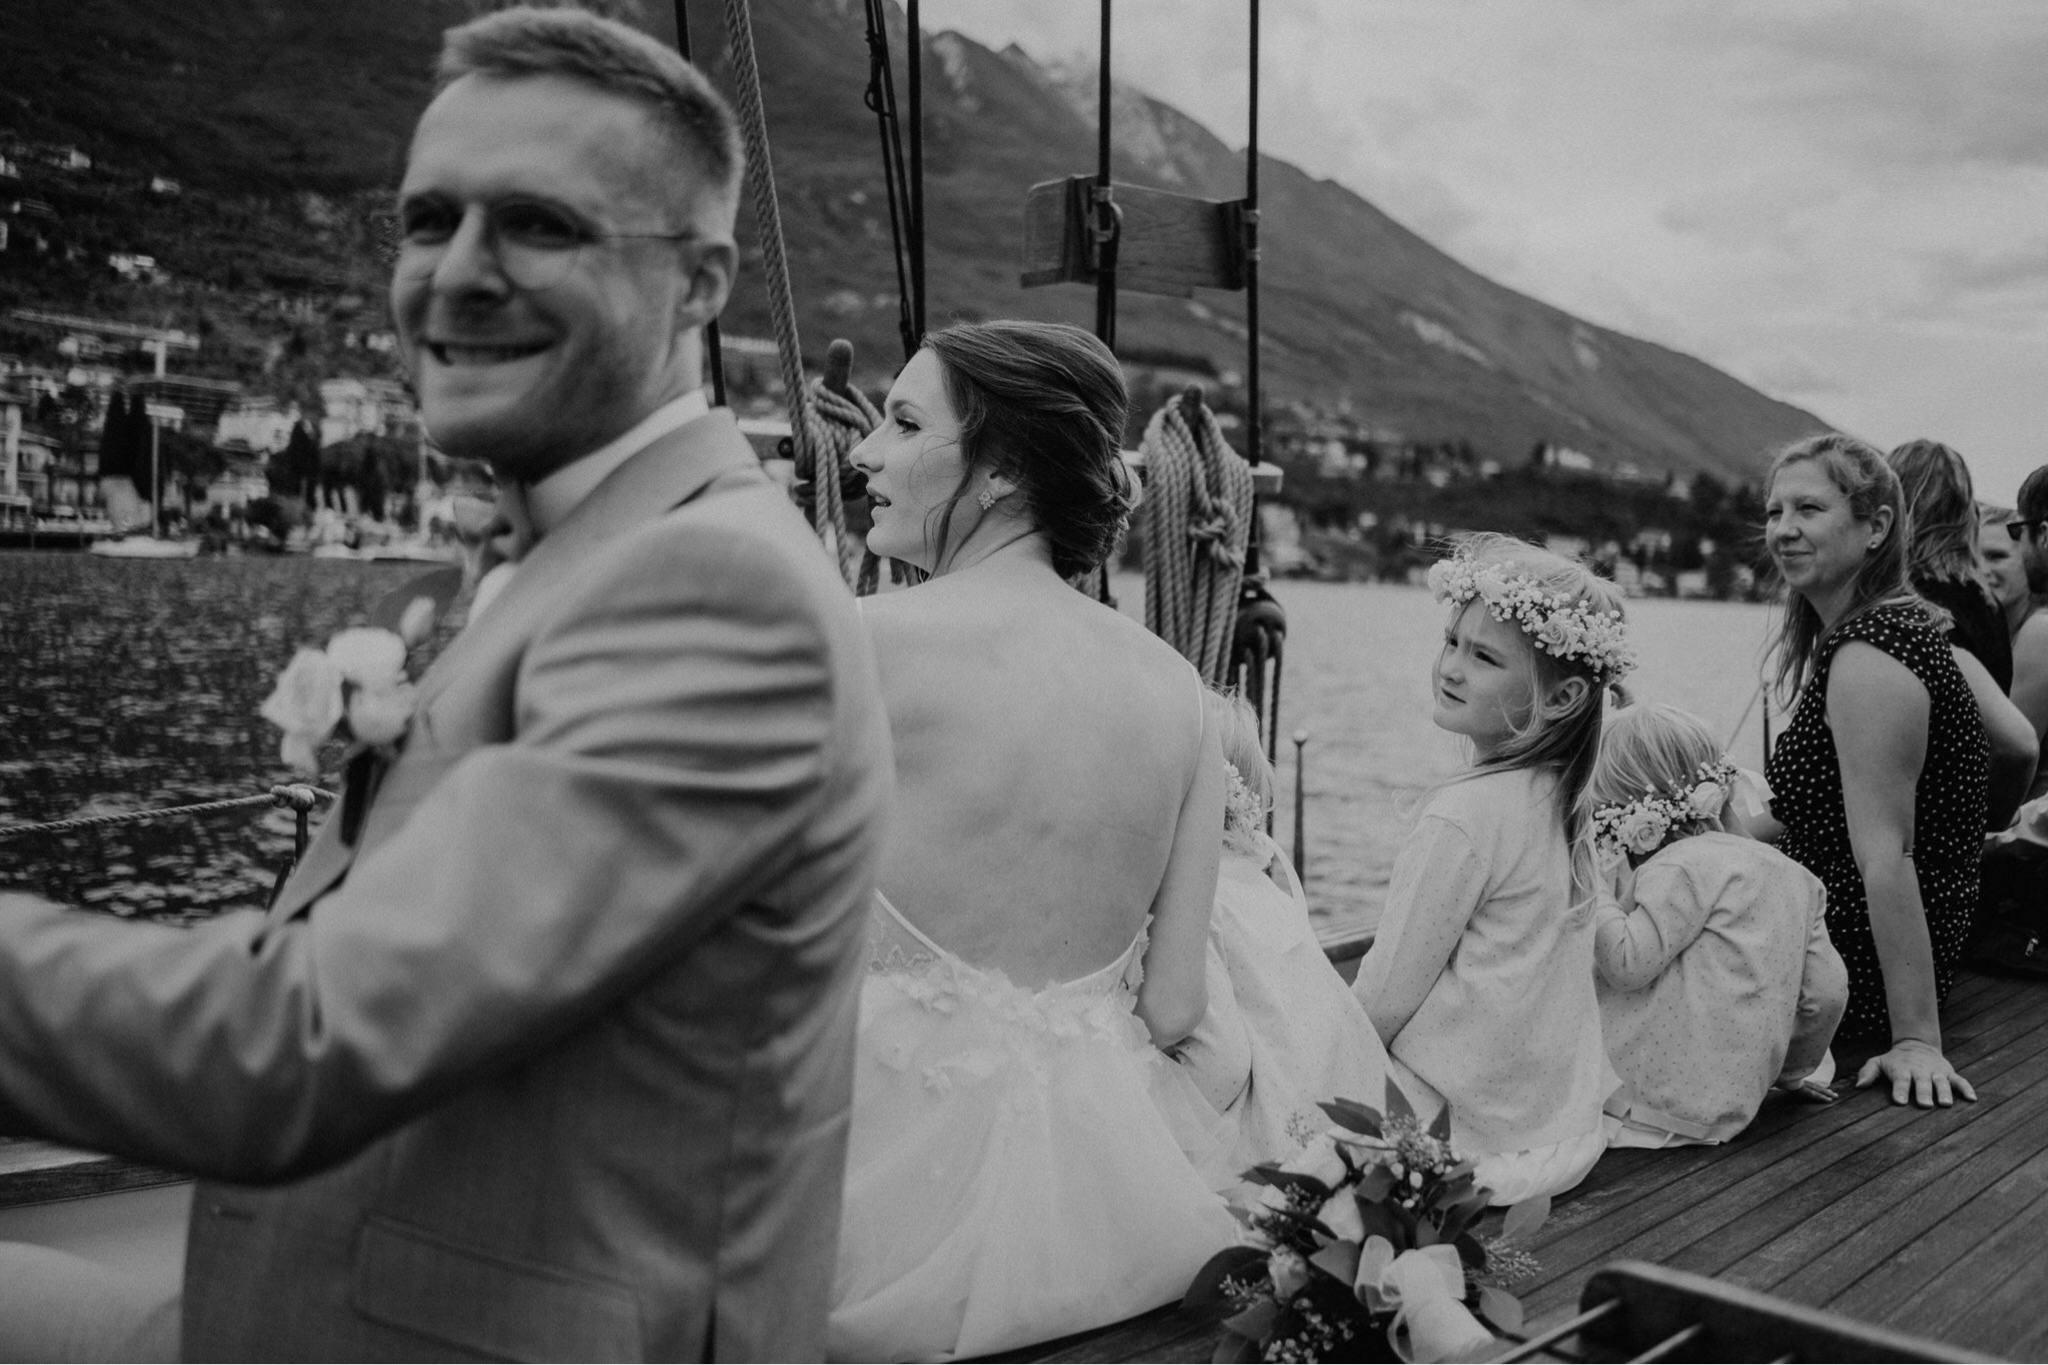 23 la 02 bootsfahrt 1100 weddinphotographer Hochzeitsfotograf newzealand hamilton Weddingphotography Stuttgart